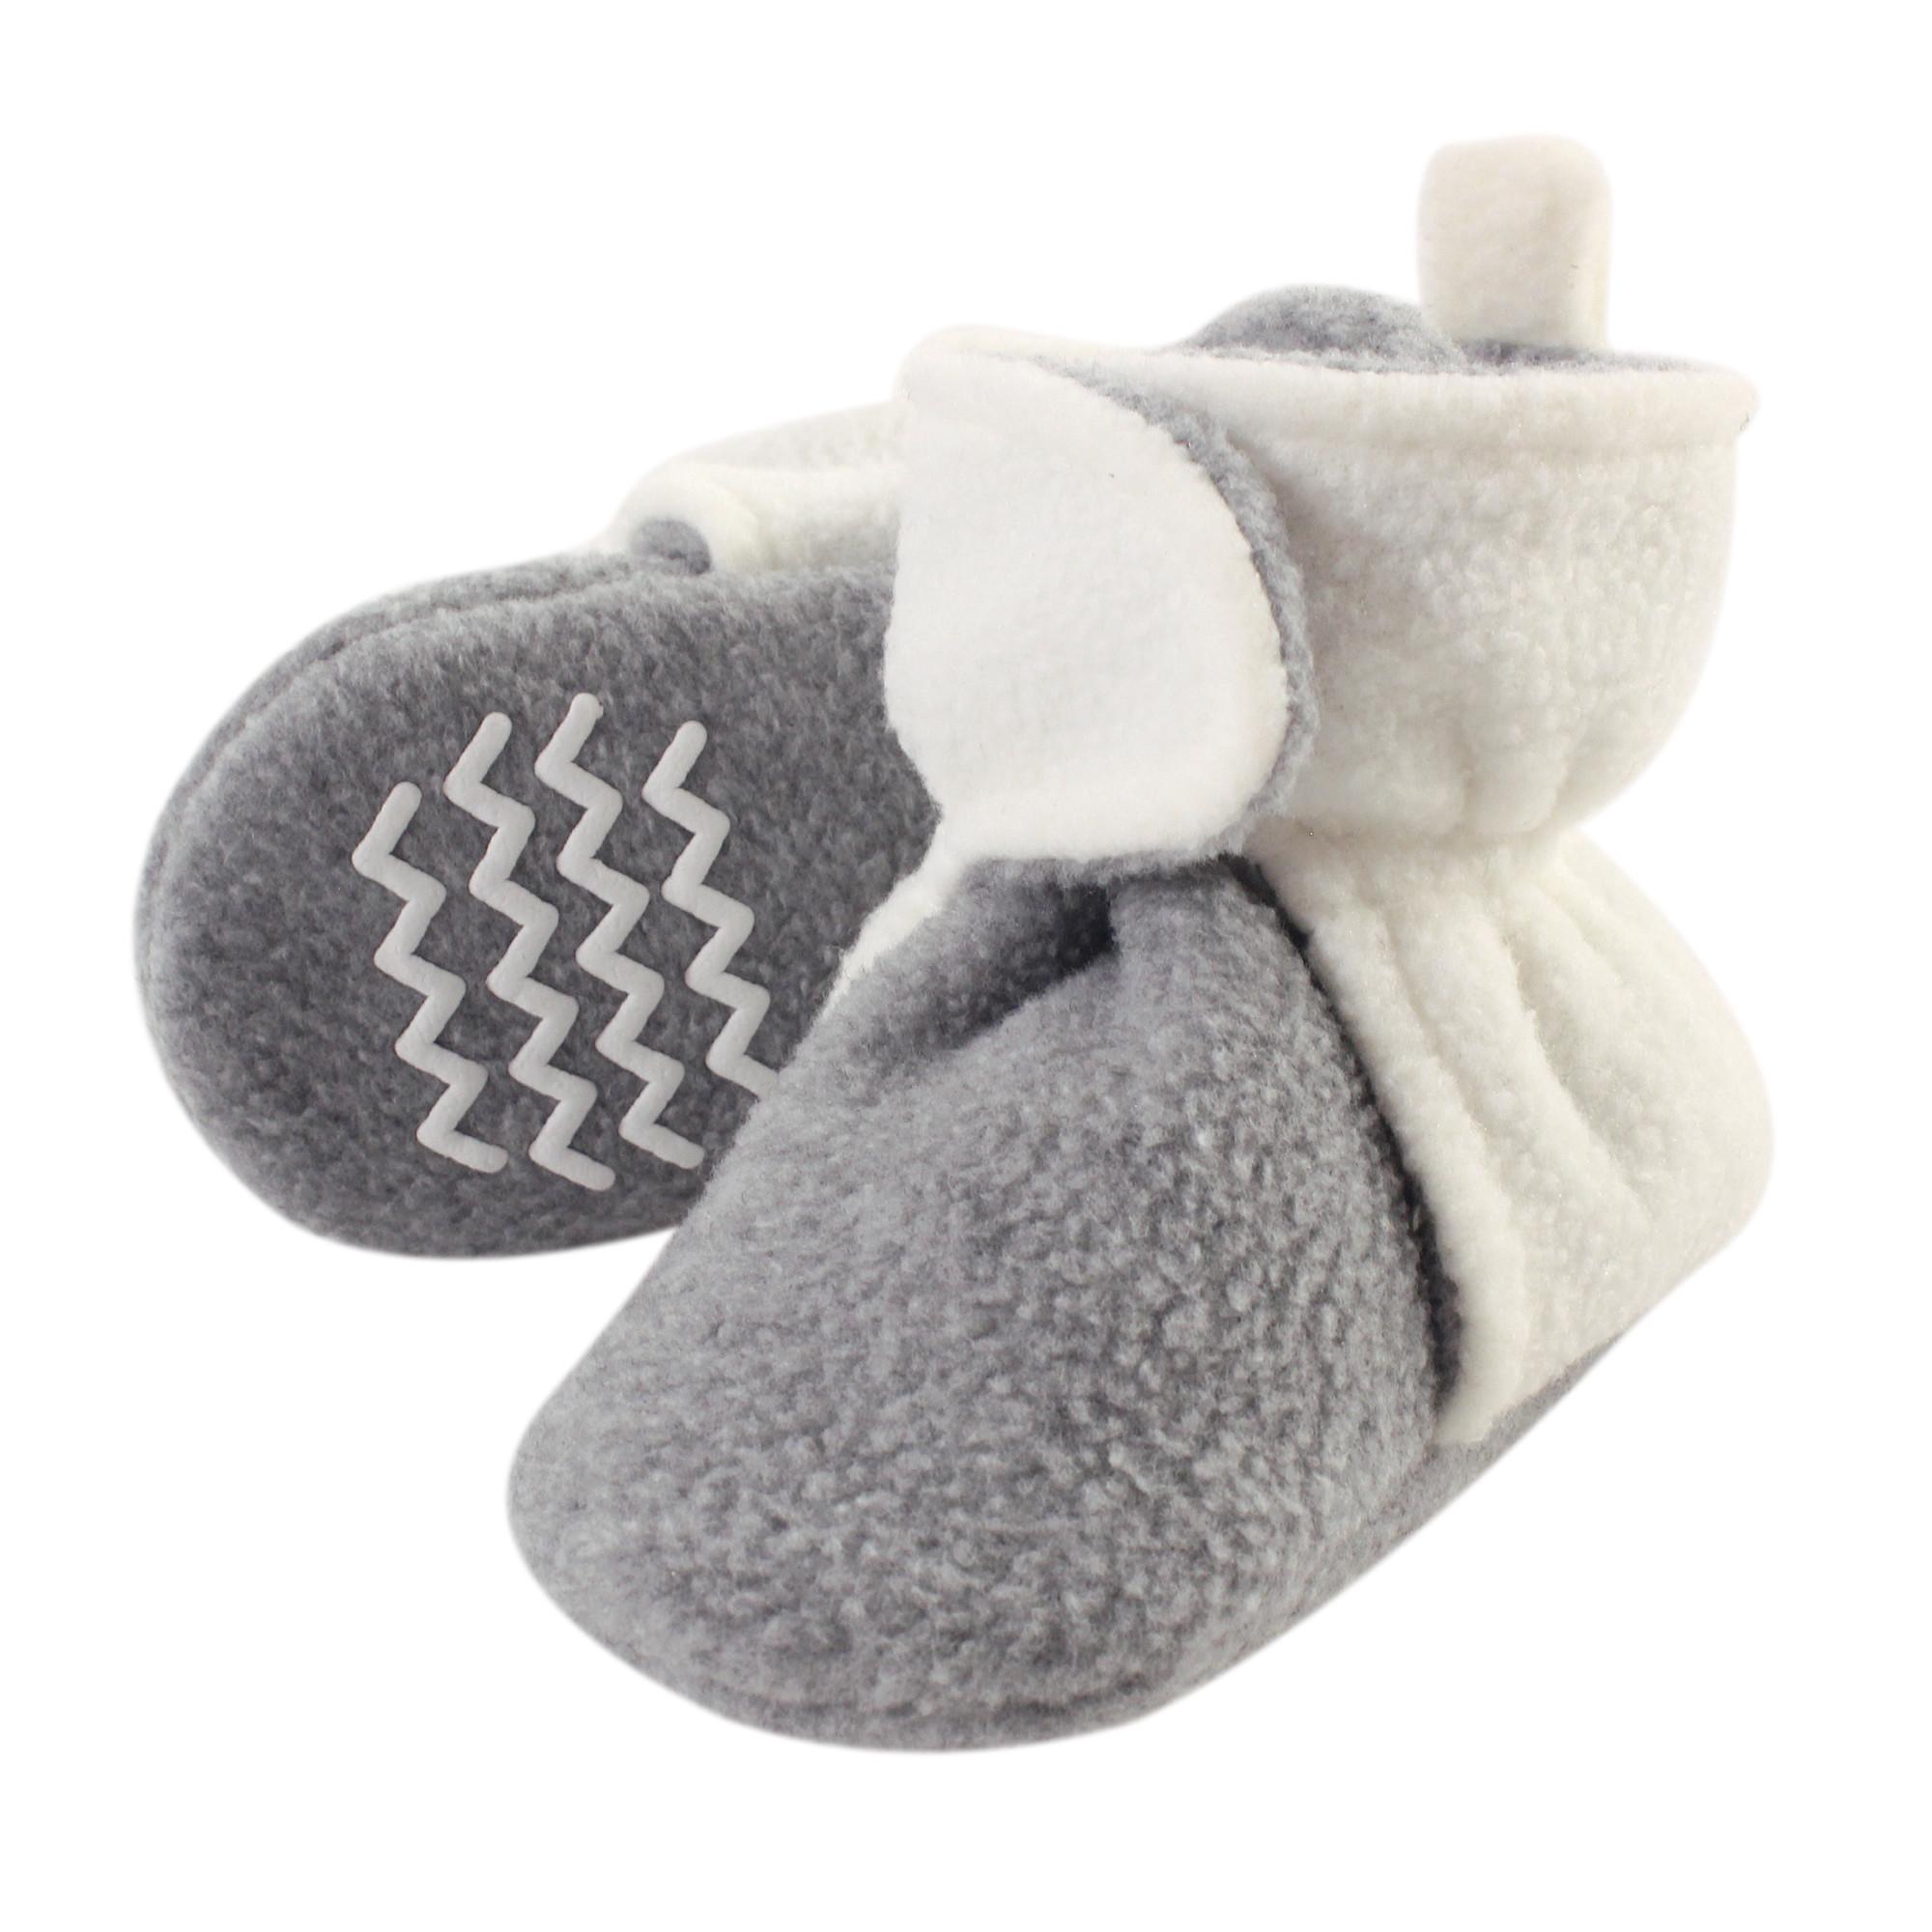 Hudson Baby Baby Cozy Fleece Booties with Non Skid Bottom